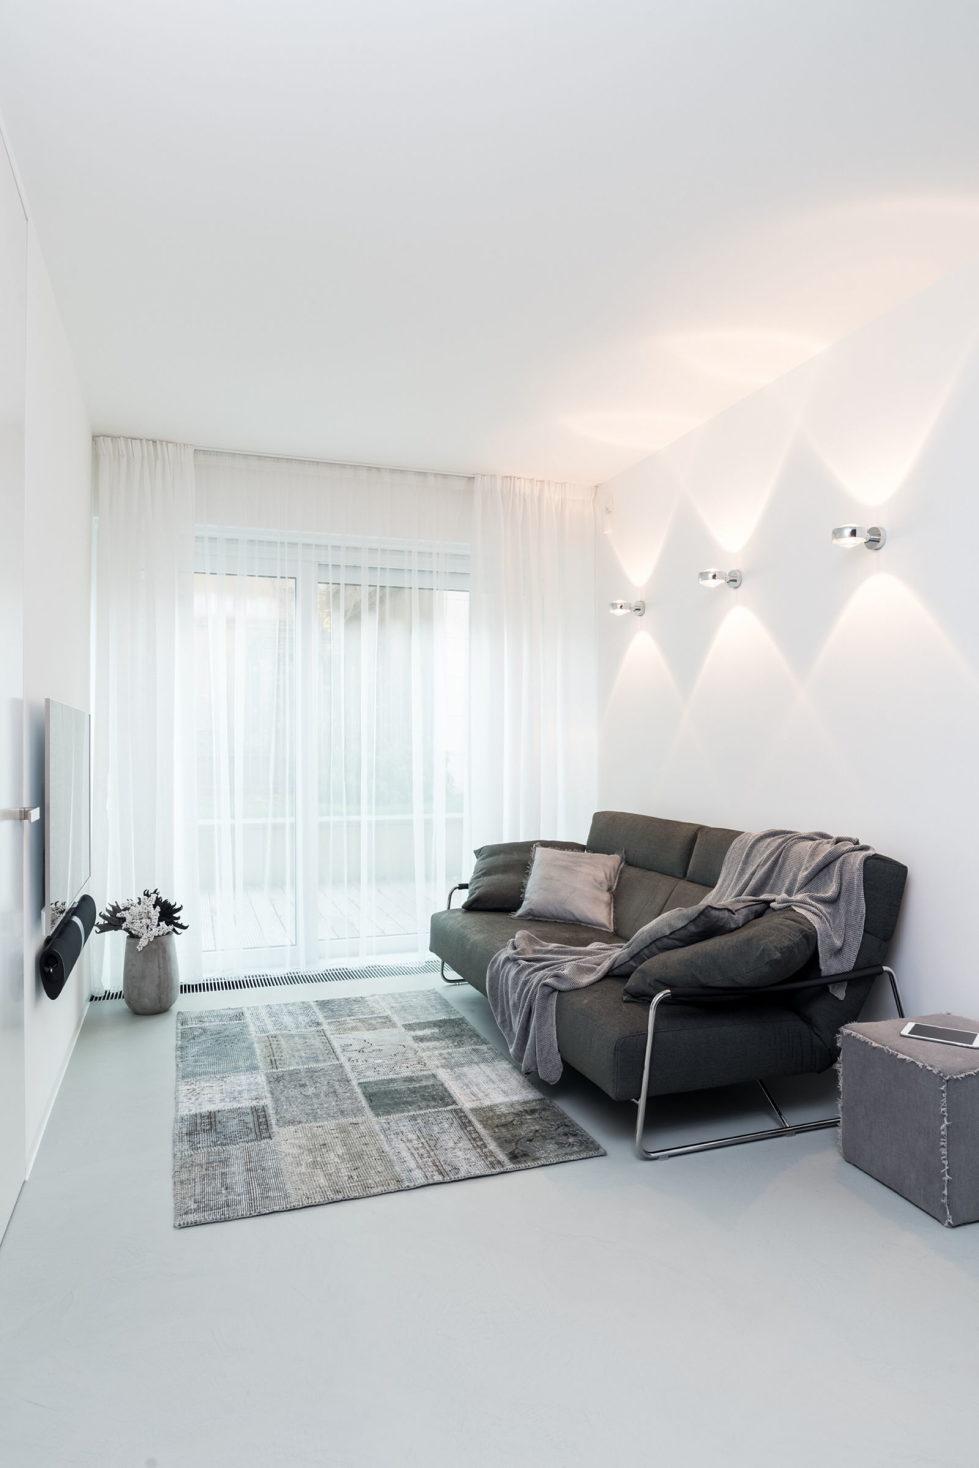 12 Lofts In Prague From OOOOX Studio 15